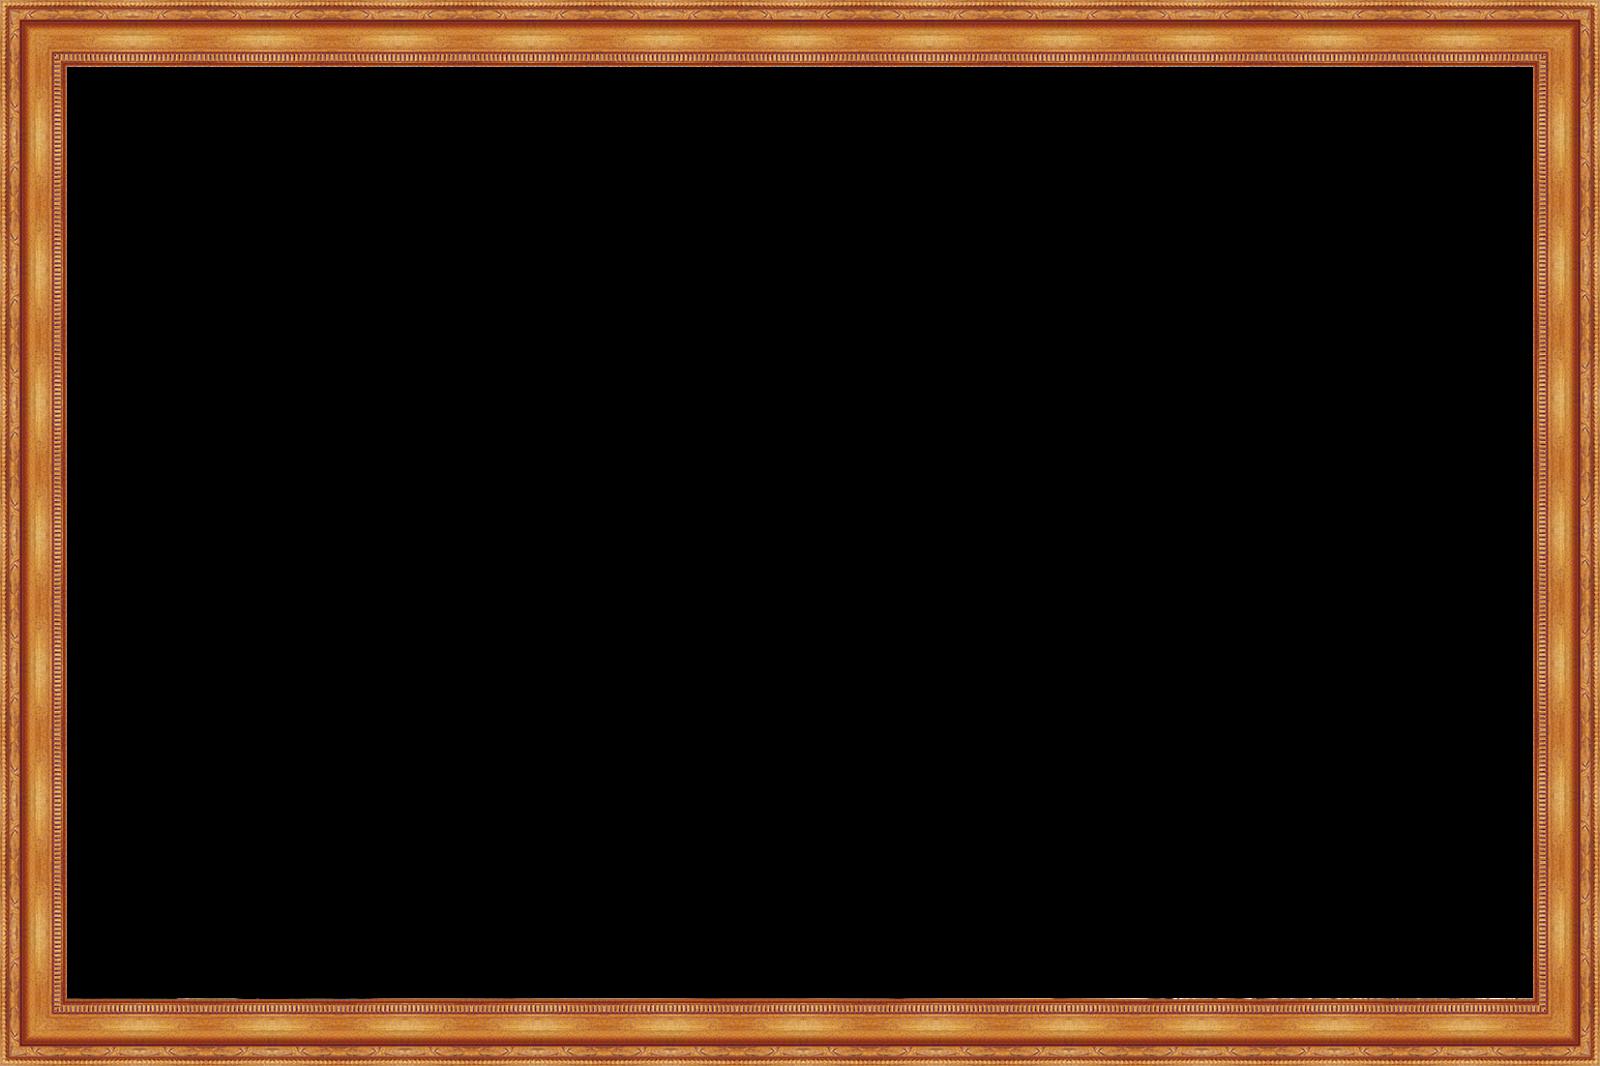 Marcos Gratis para copiar y descargar: marco de madera en png para on victor basili, ivar jacobson, james rumbaugh, craig larman, edward yourdon, david parnas, watts humphrey, kent beck, martin fowler, barry boehm, grady booch,